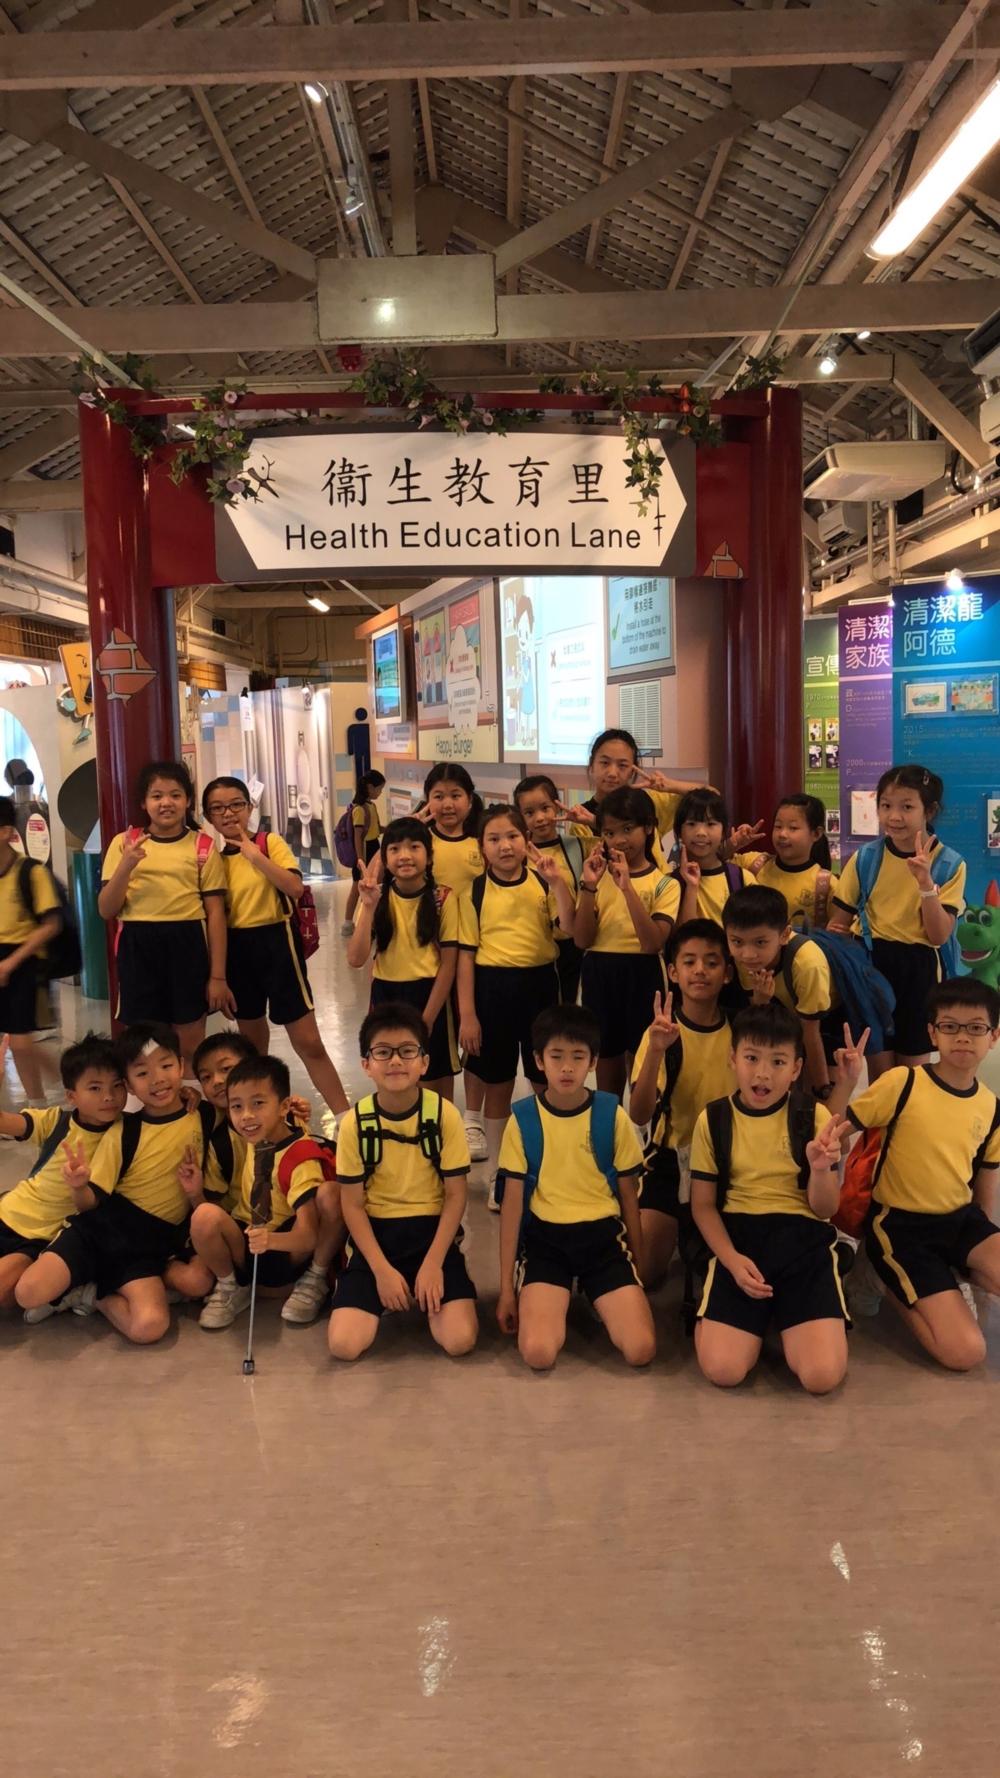 http://pohckwps.edu.hk/sites/default/files/23_13.jpg